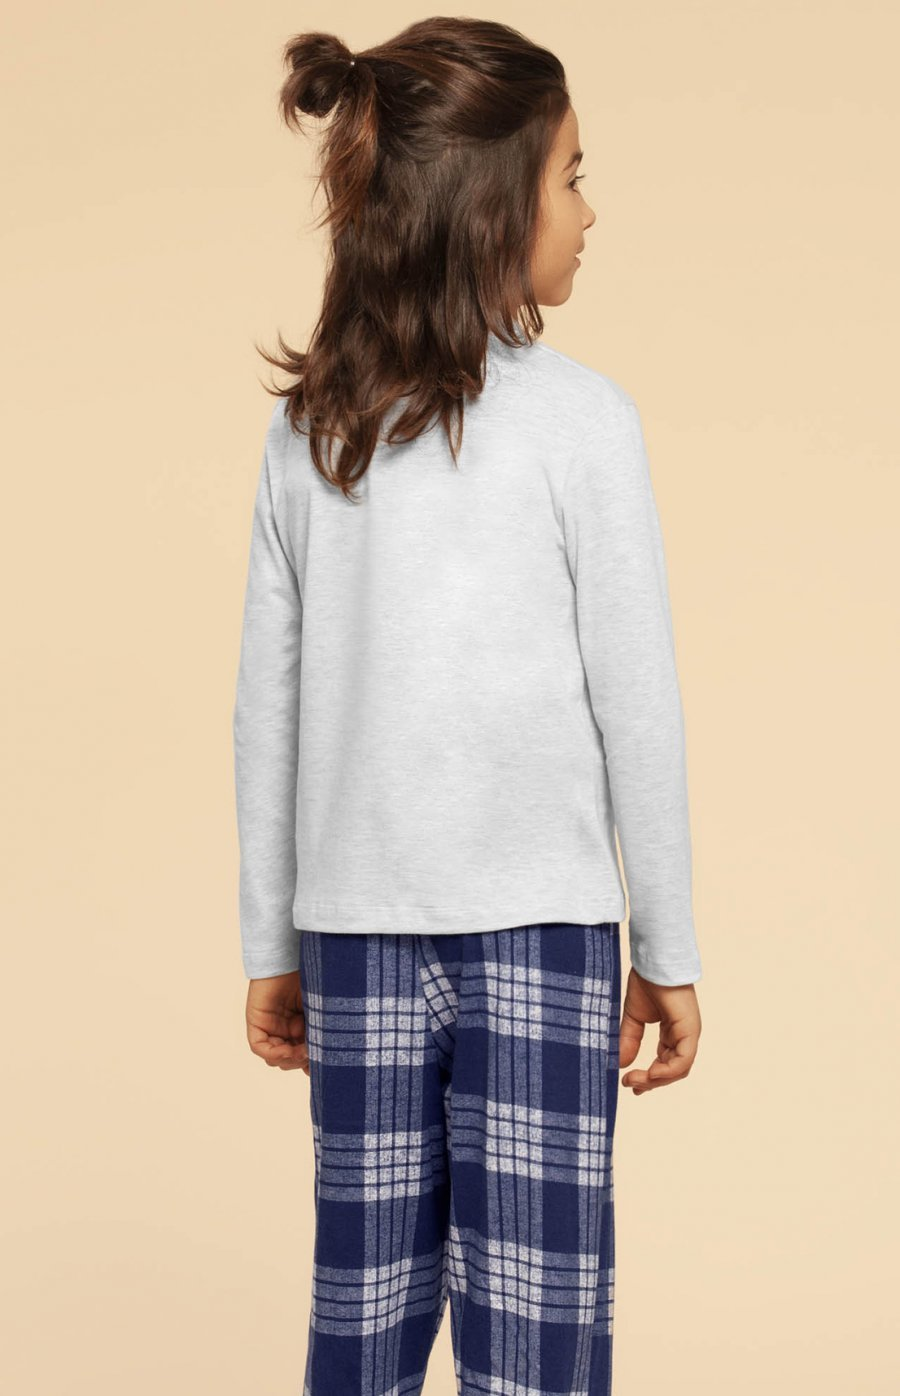 Pijama Infantil Meia Malha Family Dog Inverno 2019 PROMO